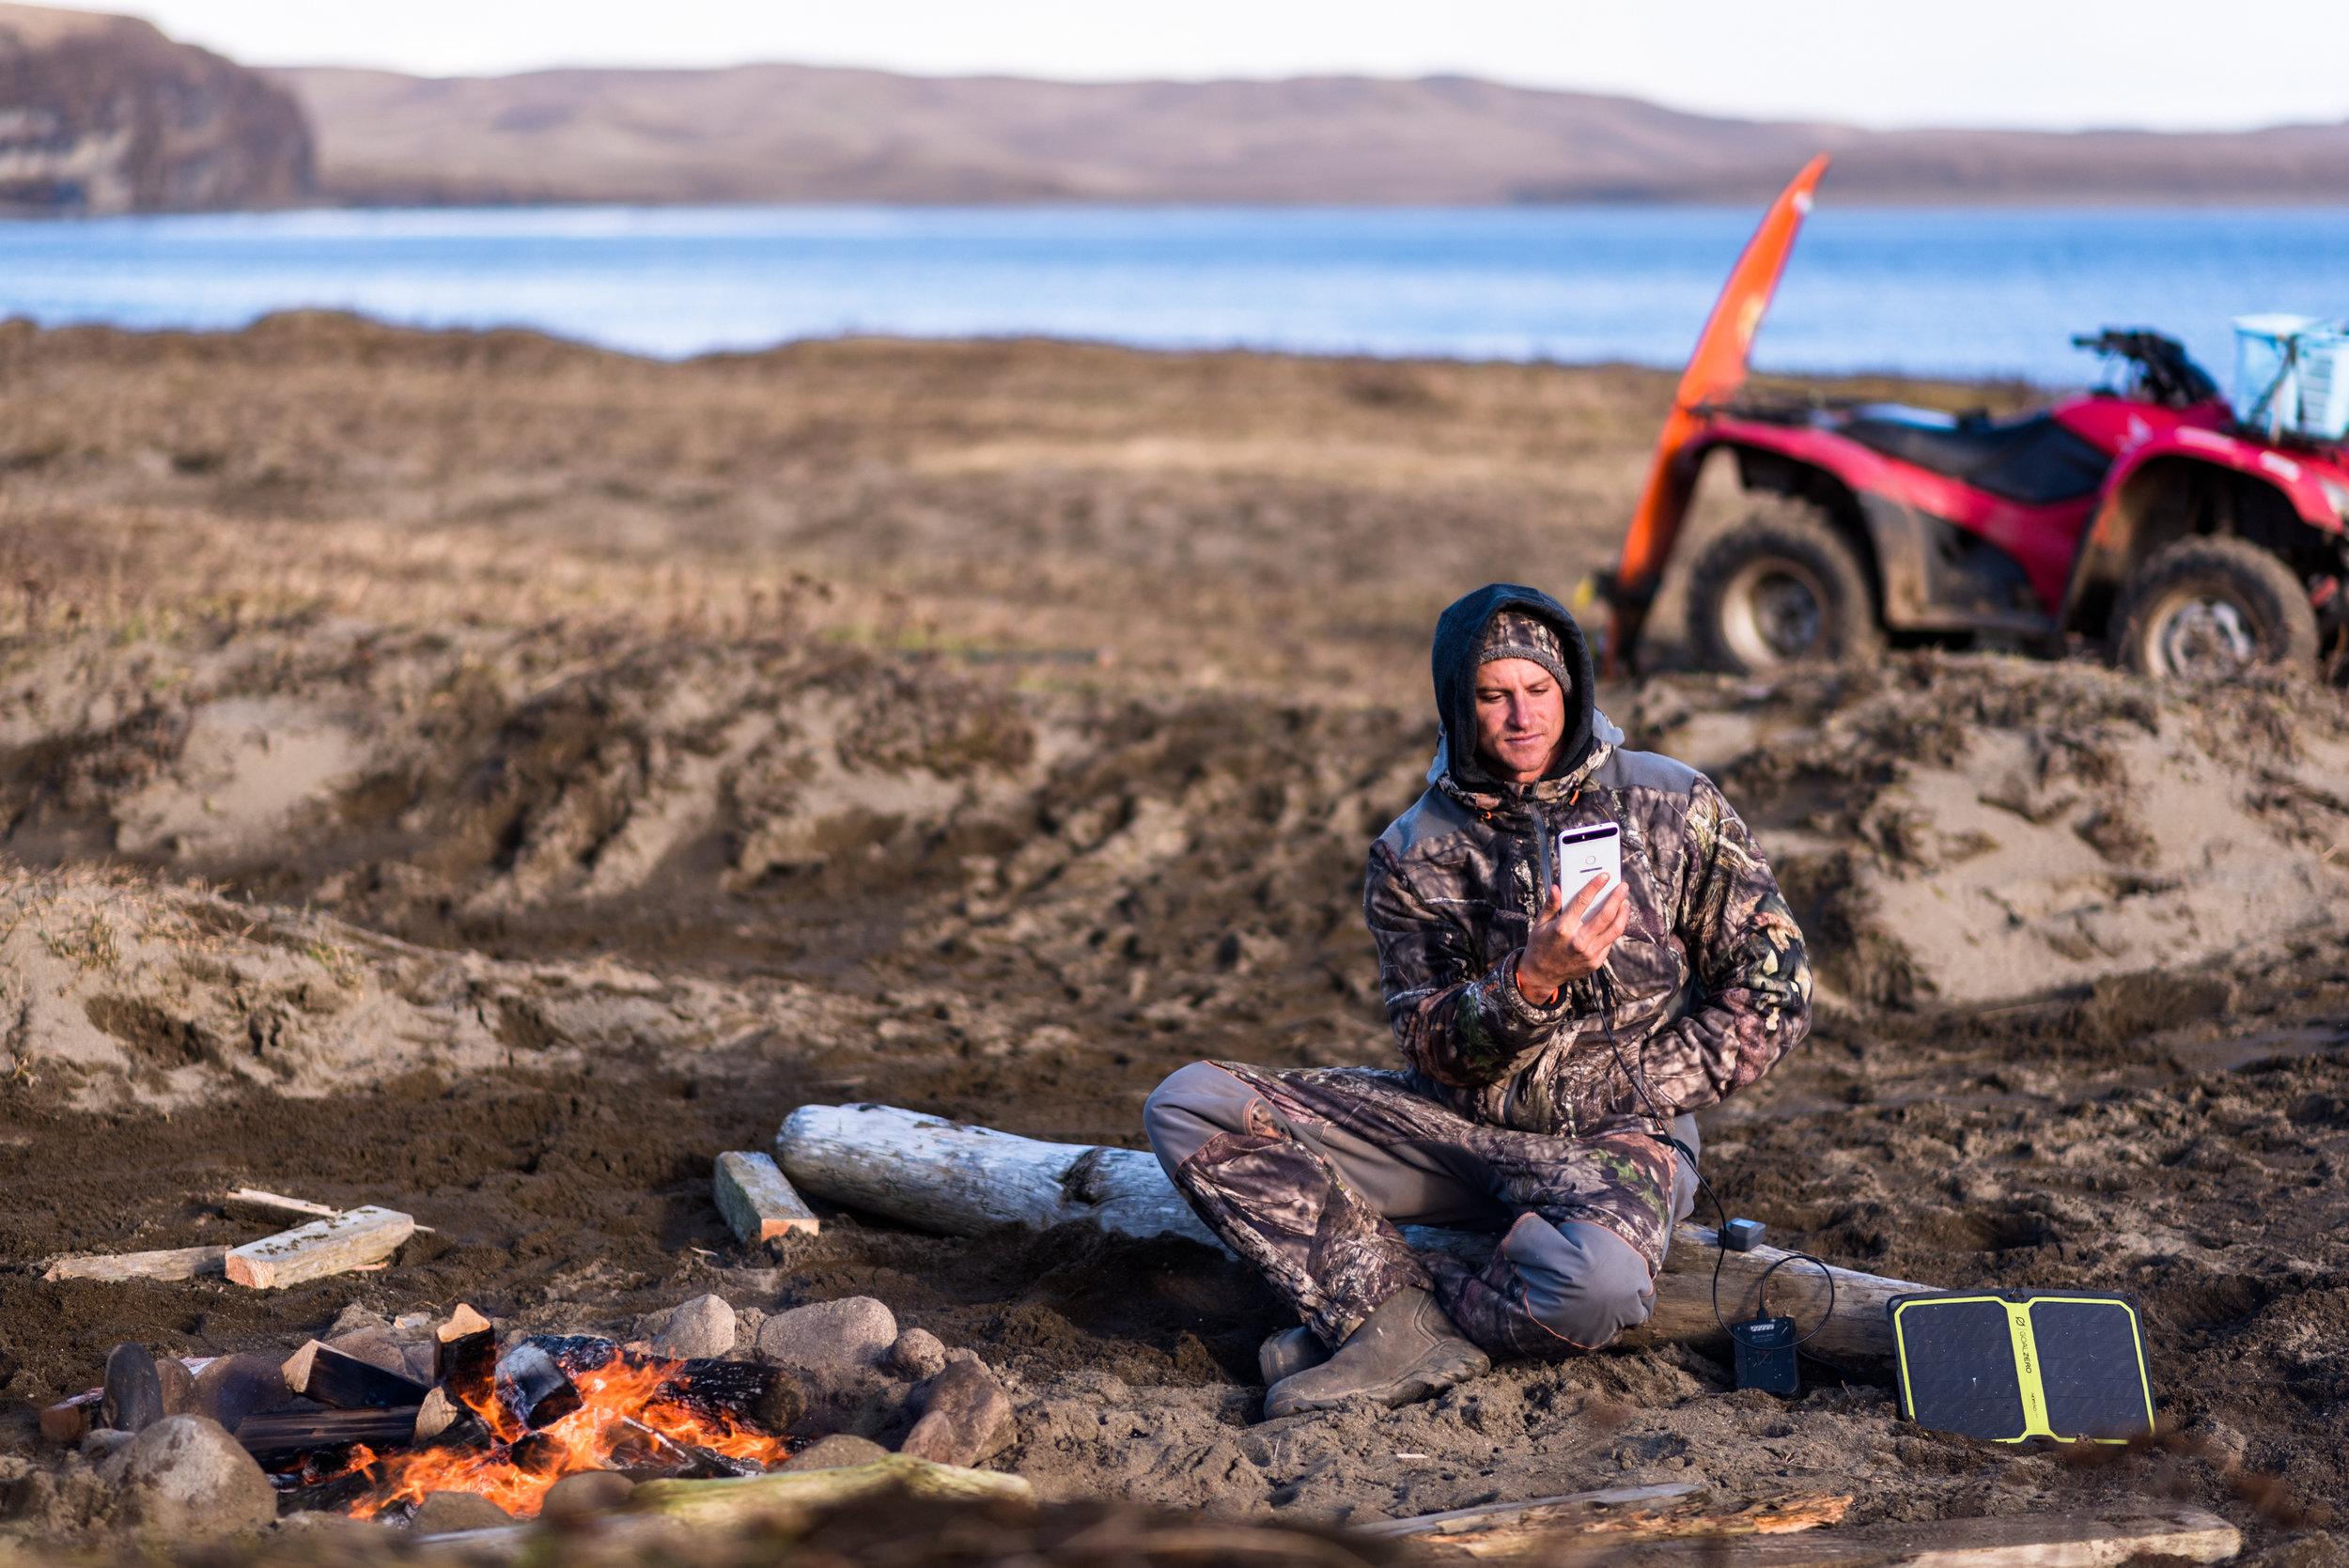 AleutianIslands-ChrisBrinleeJr-NOV16-D750-89.jpg